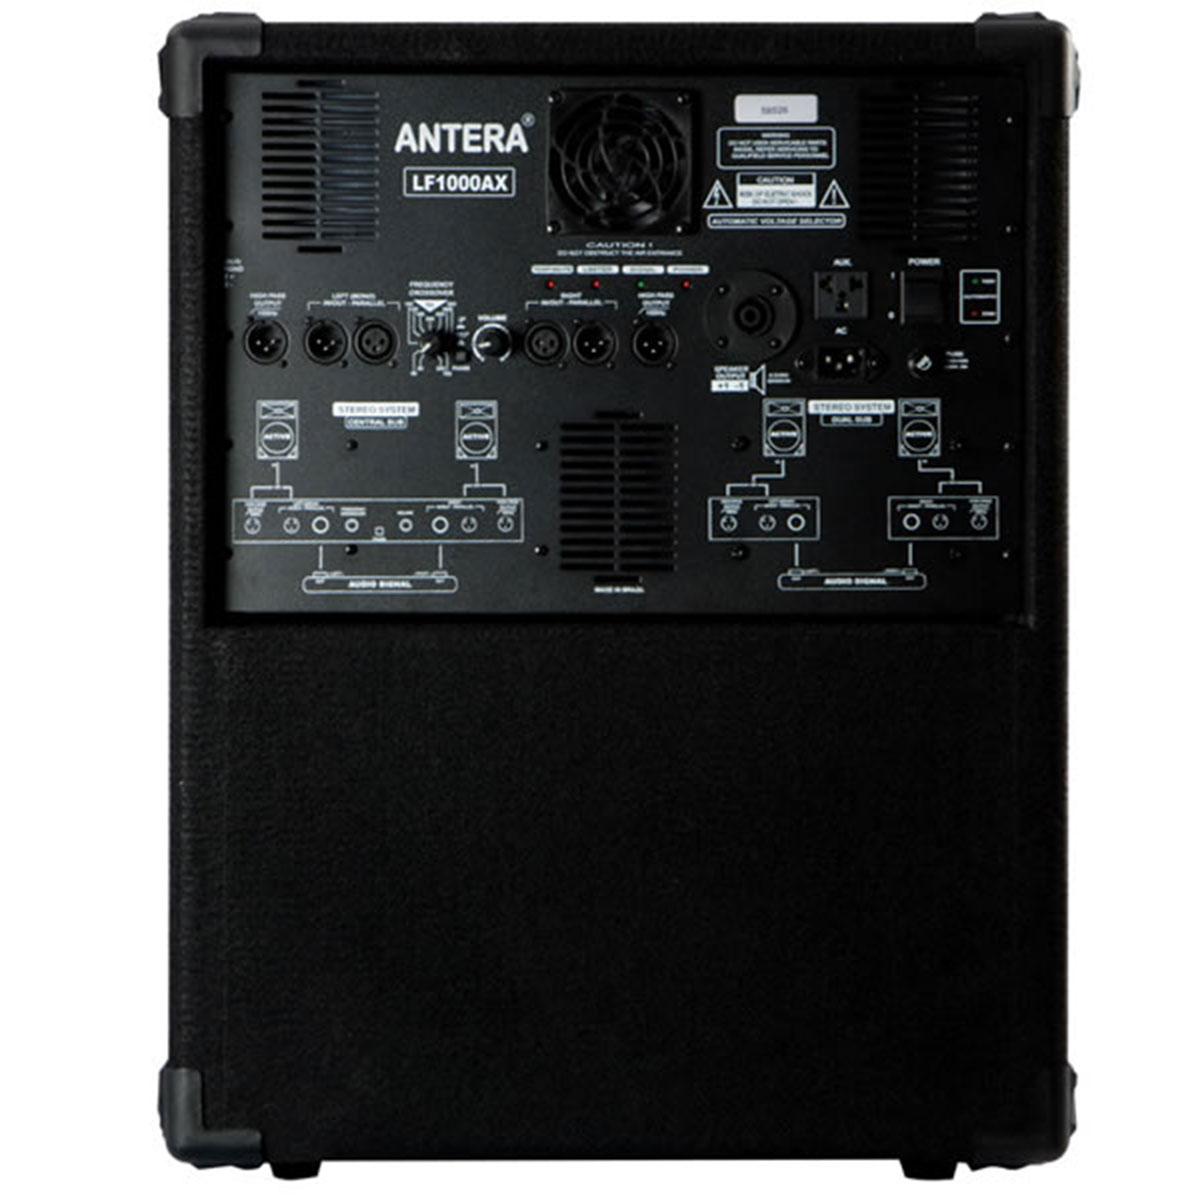 Subwoofer Ativo Fal 15 Pol 600W - LF 1000 A X Antera